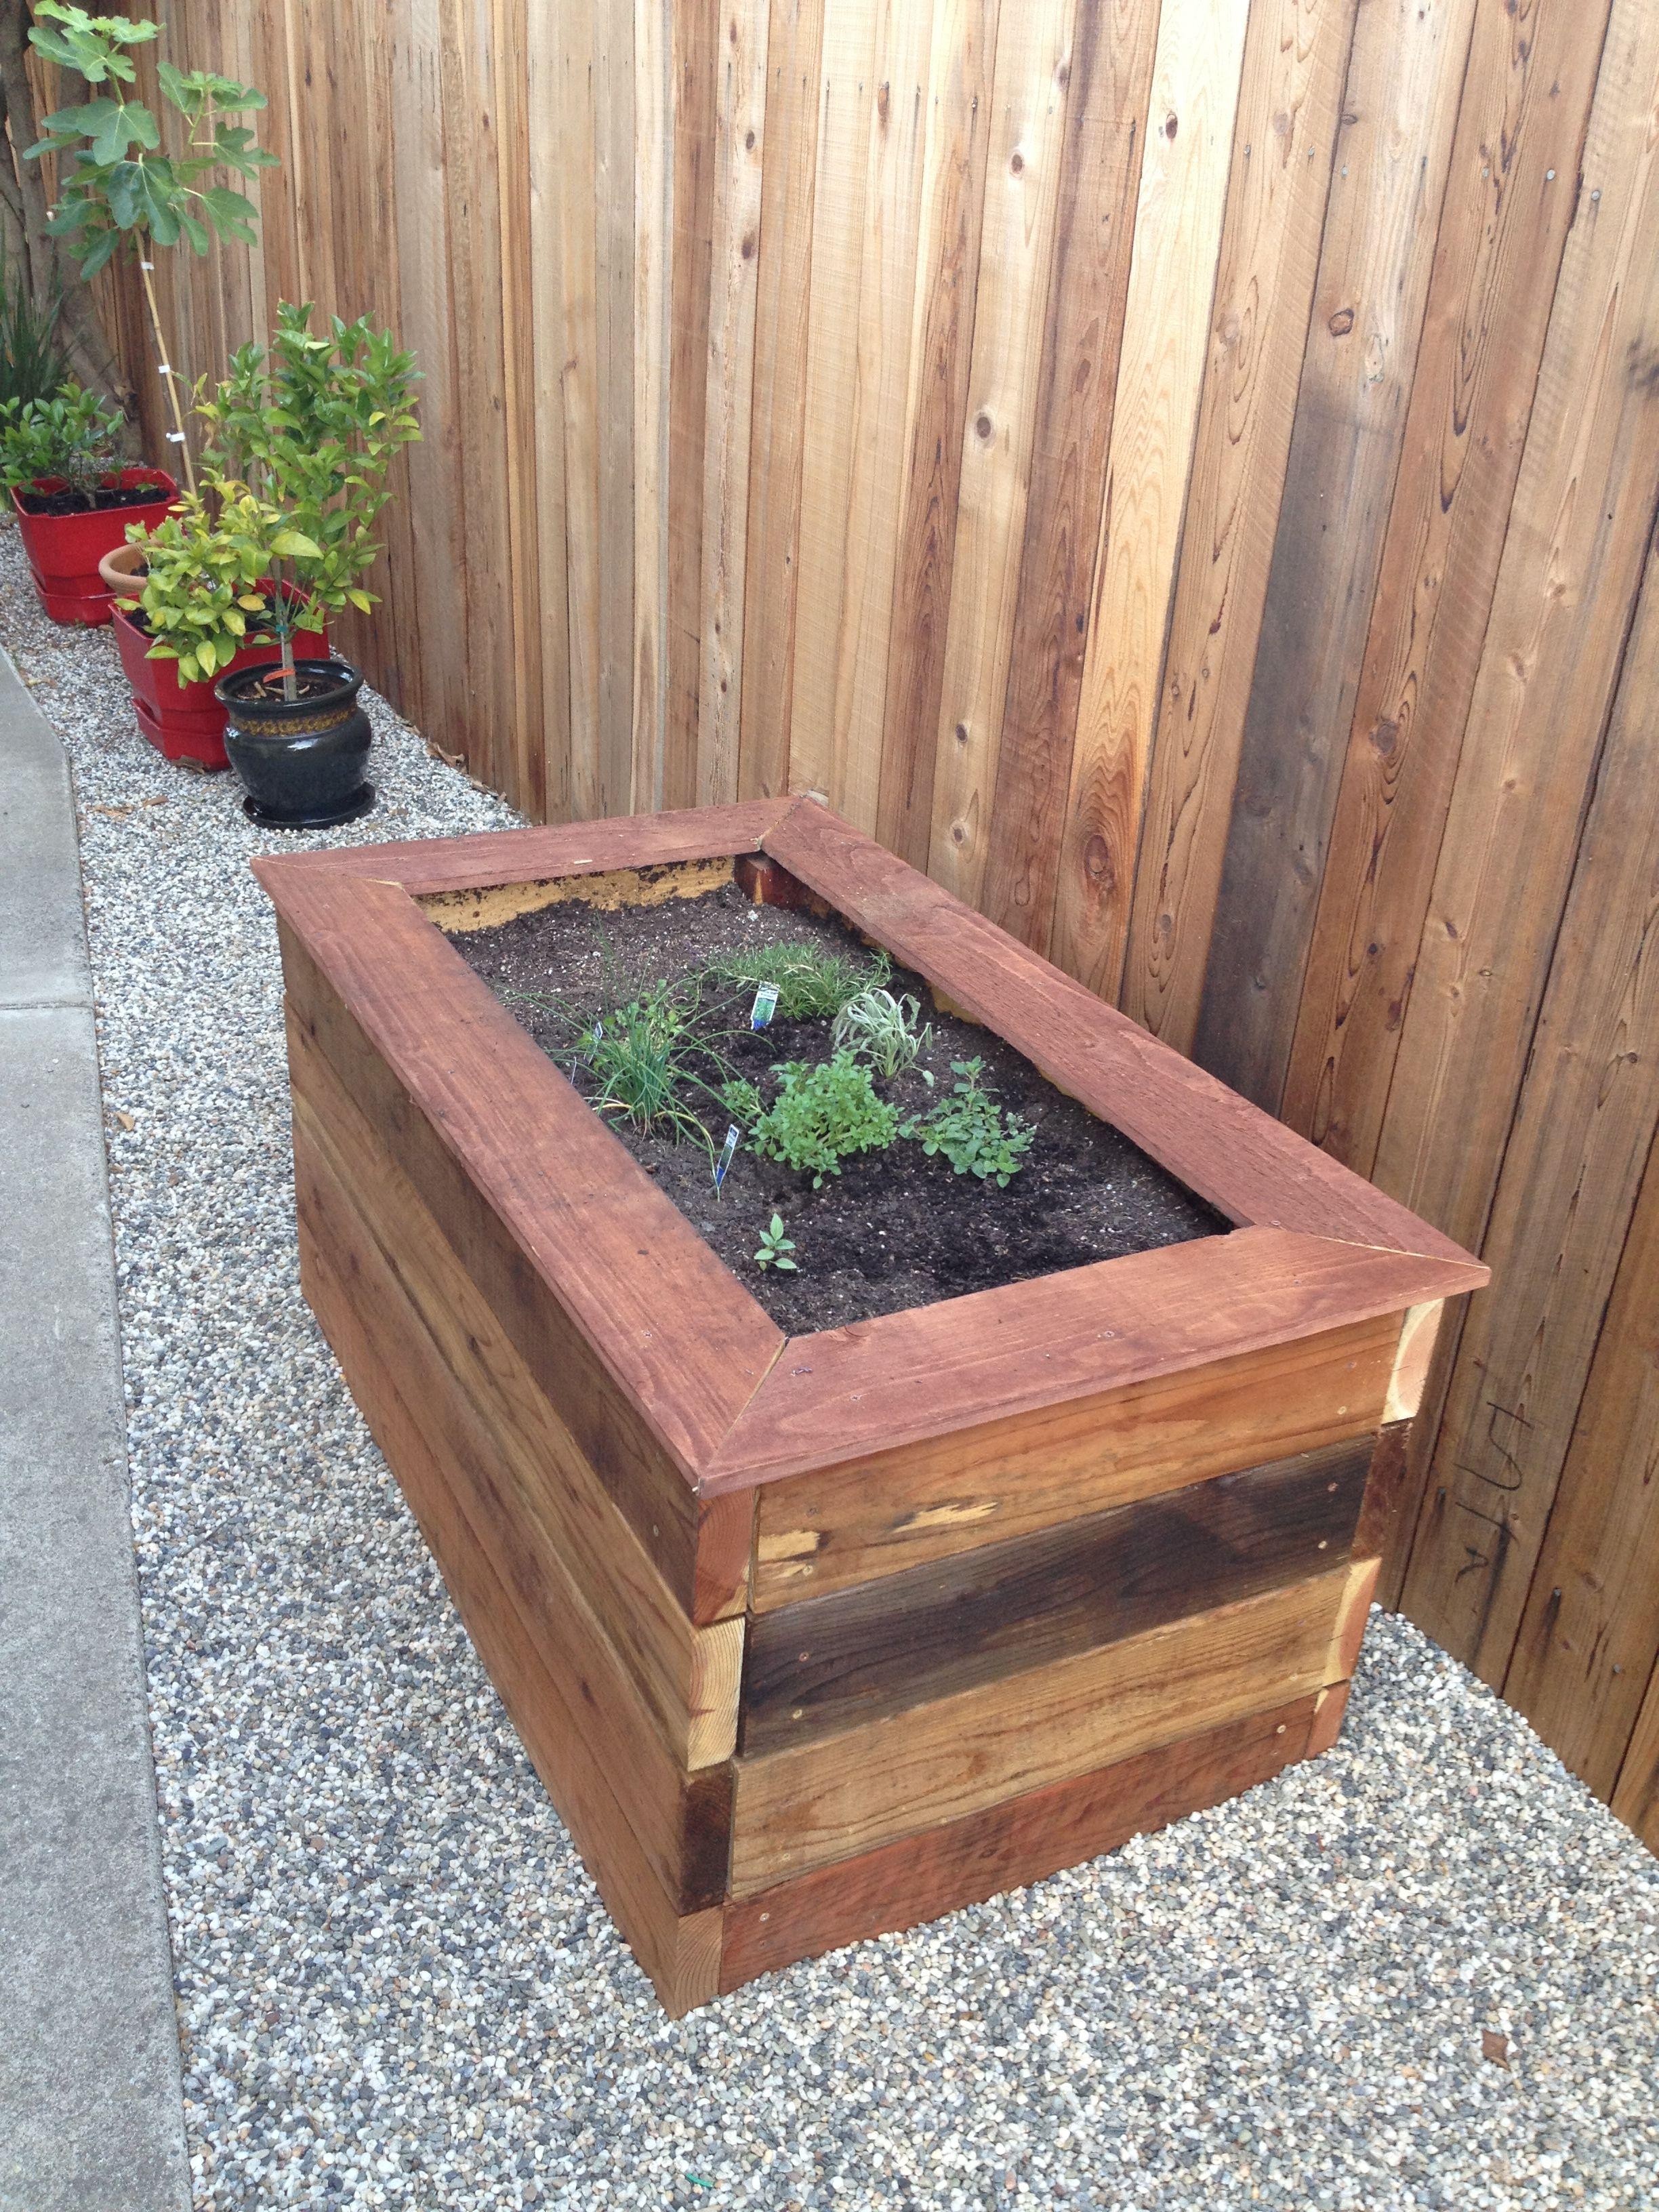 Redwood Planter Box Plans Plans Free Download Raised